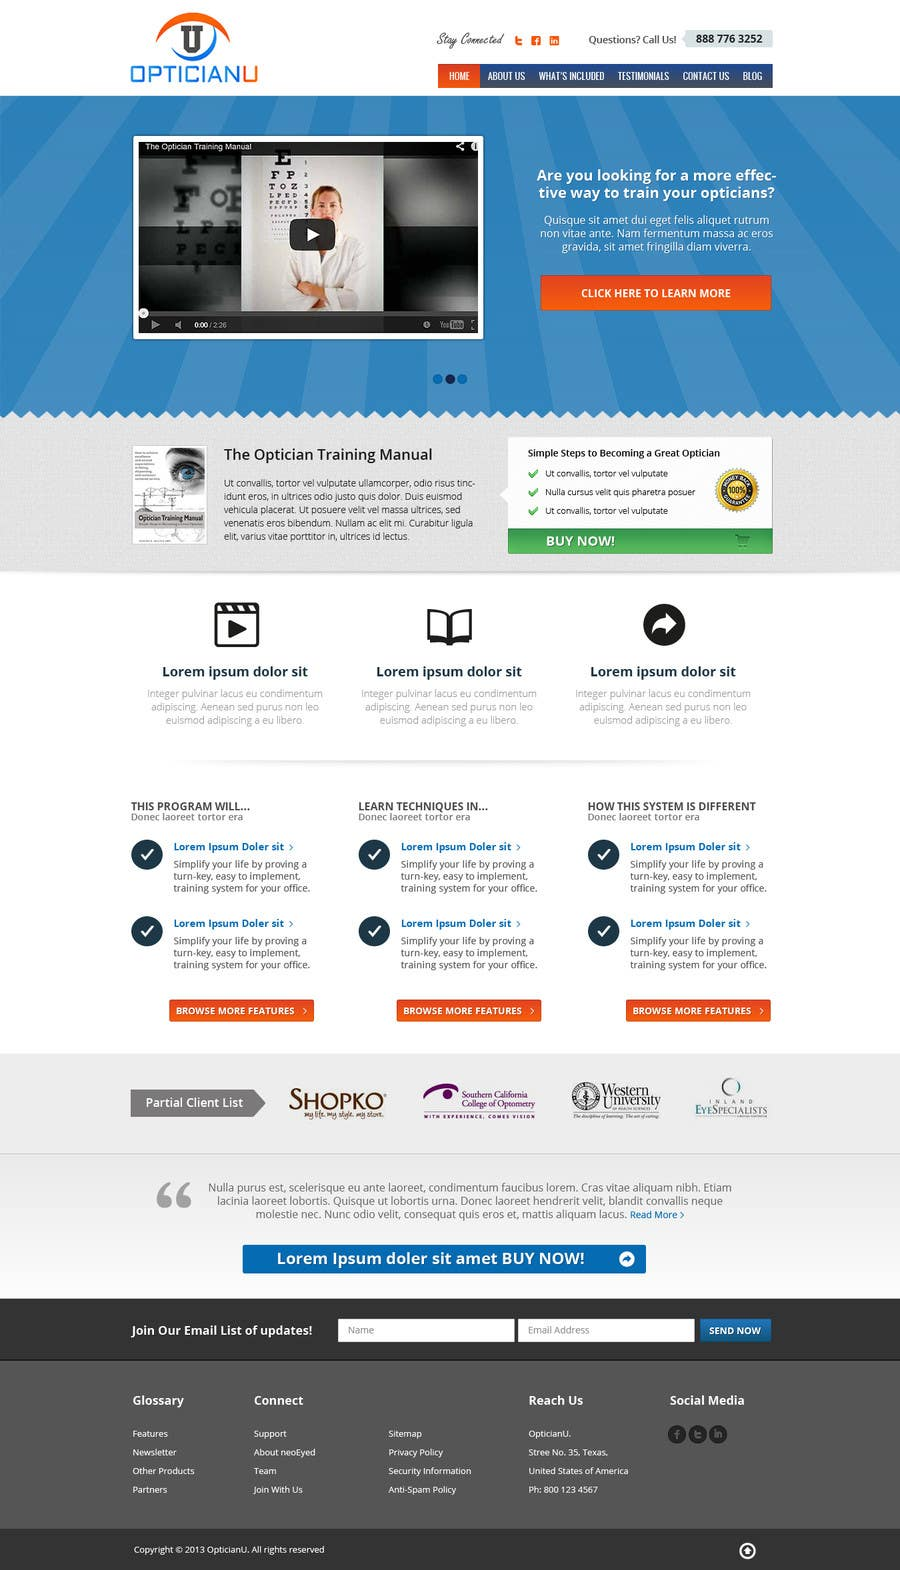 Penyertaan Peraduan #                                        6                                      untuk                                         Design a Website Mockup for www.OpticianTraining.com